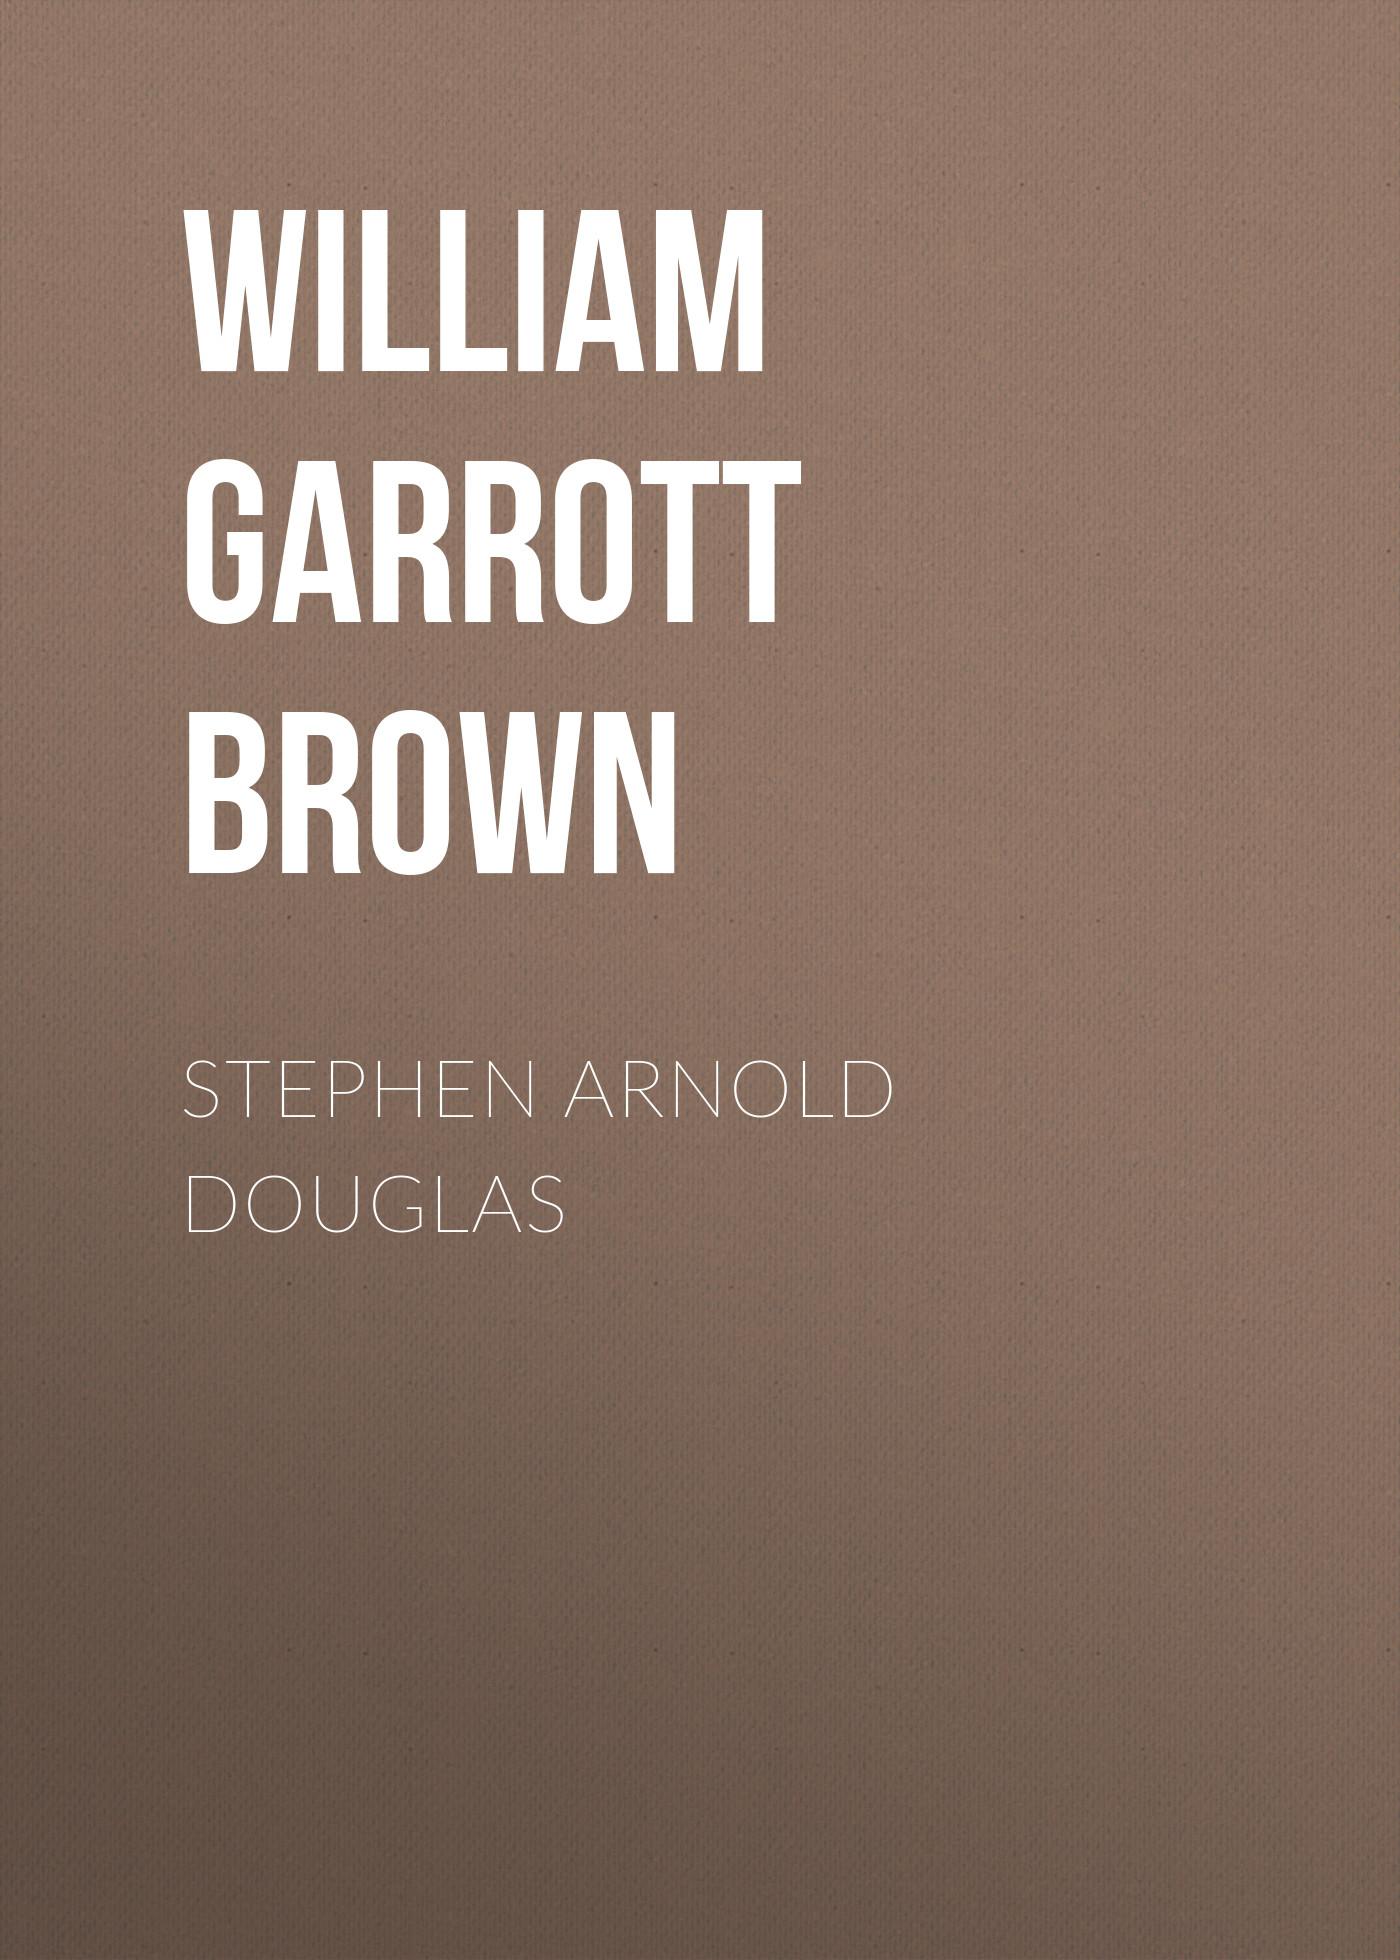 William Garrott Brown Stephen Arnold Douglas ekaterina talalakina tony brown jennifer bown william eggington mastering english through global debate